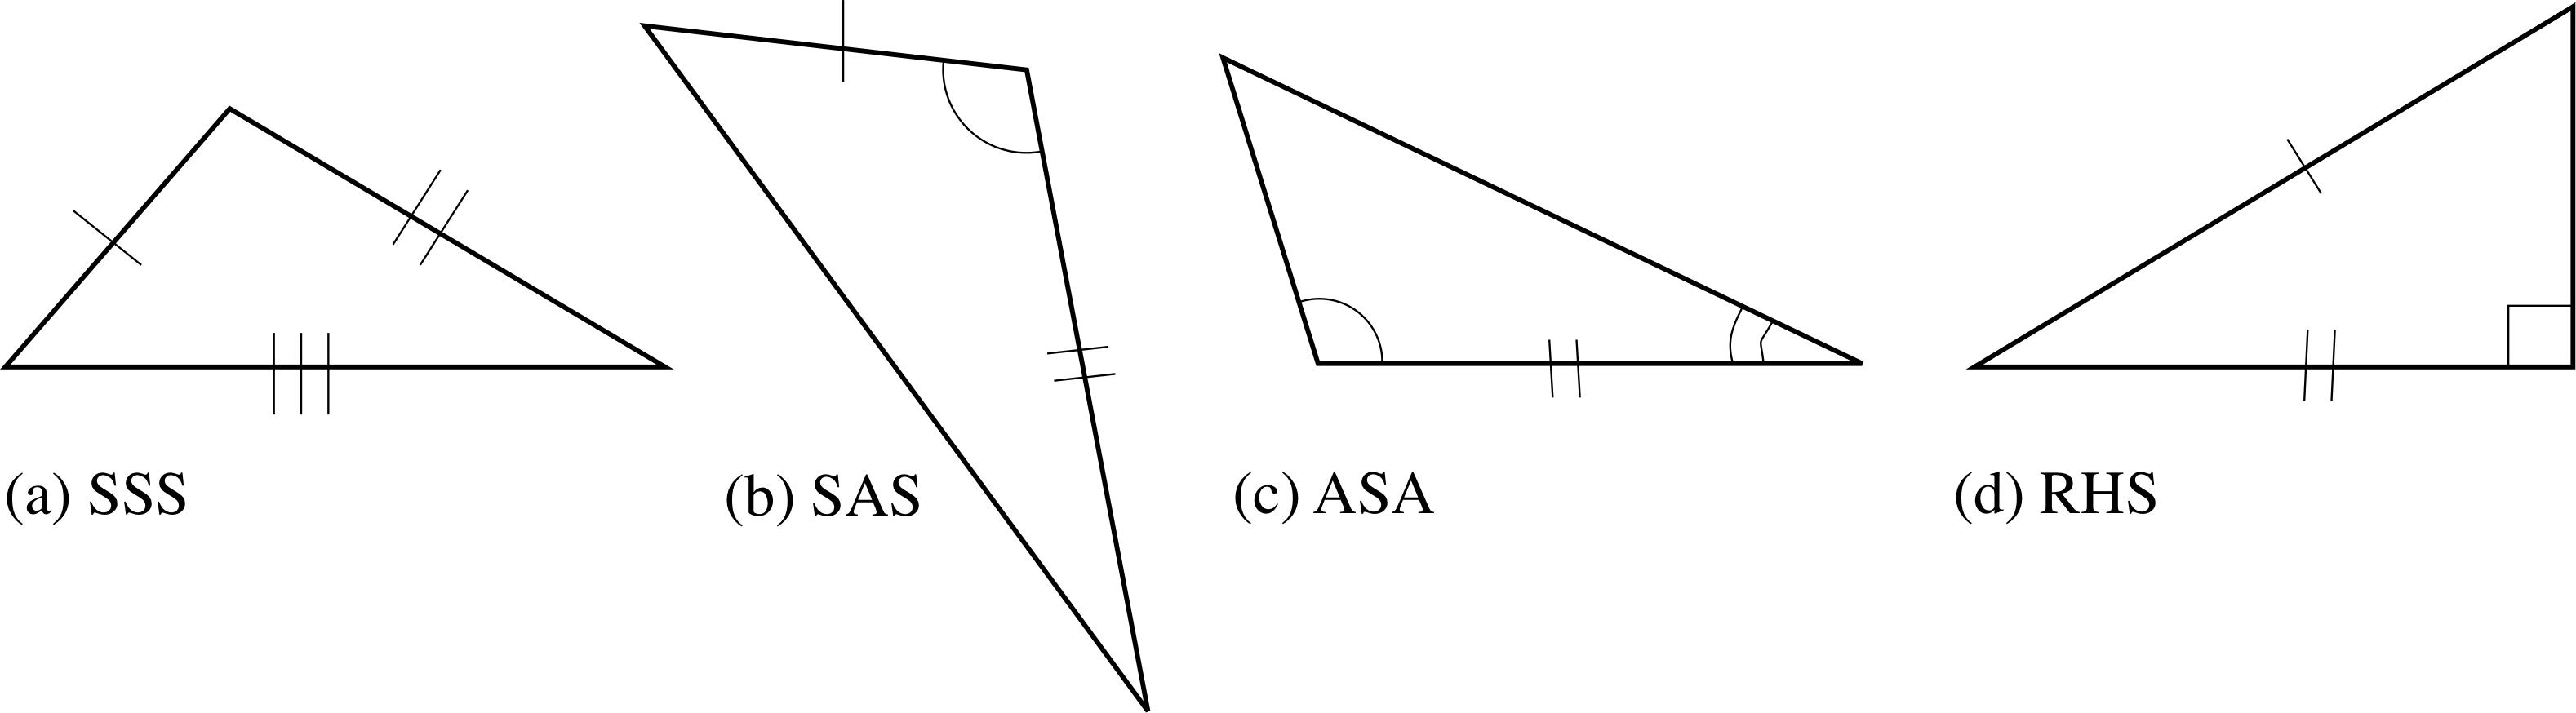 Pplato flap math 21 introducing geometry figure biocorpaavc Image collections